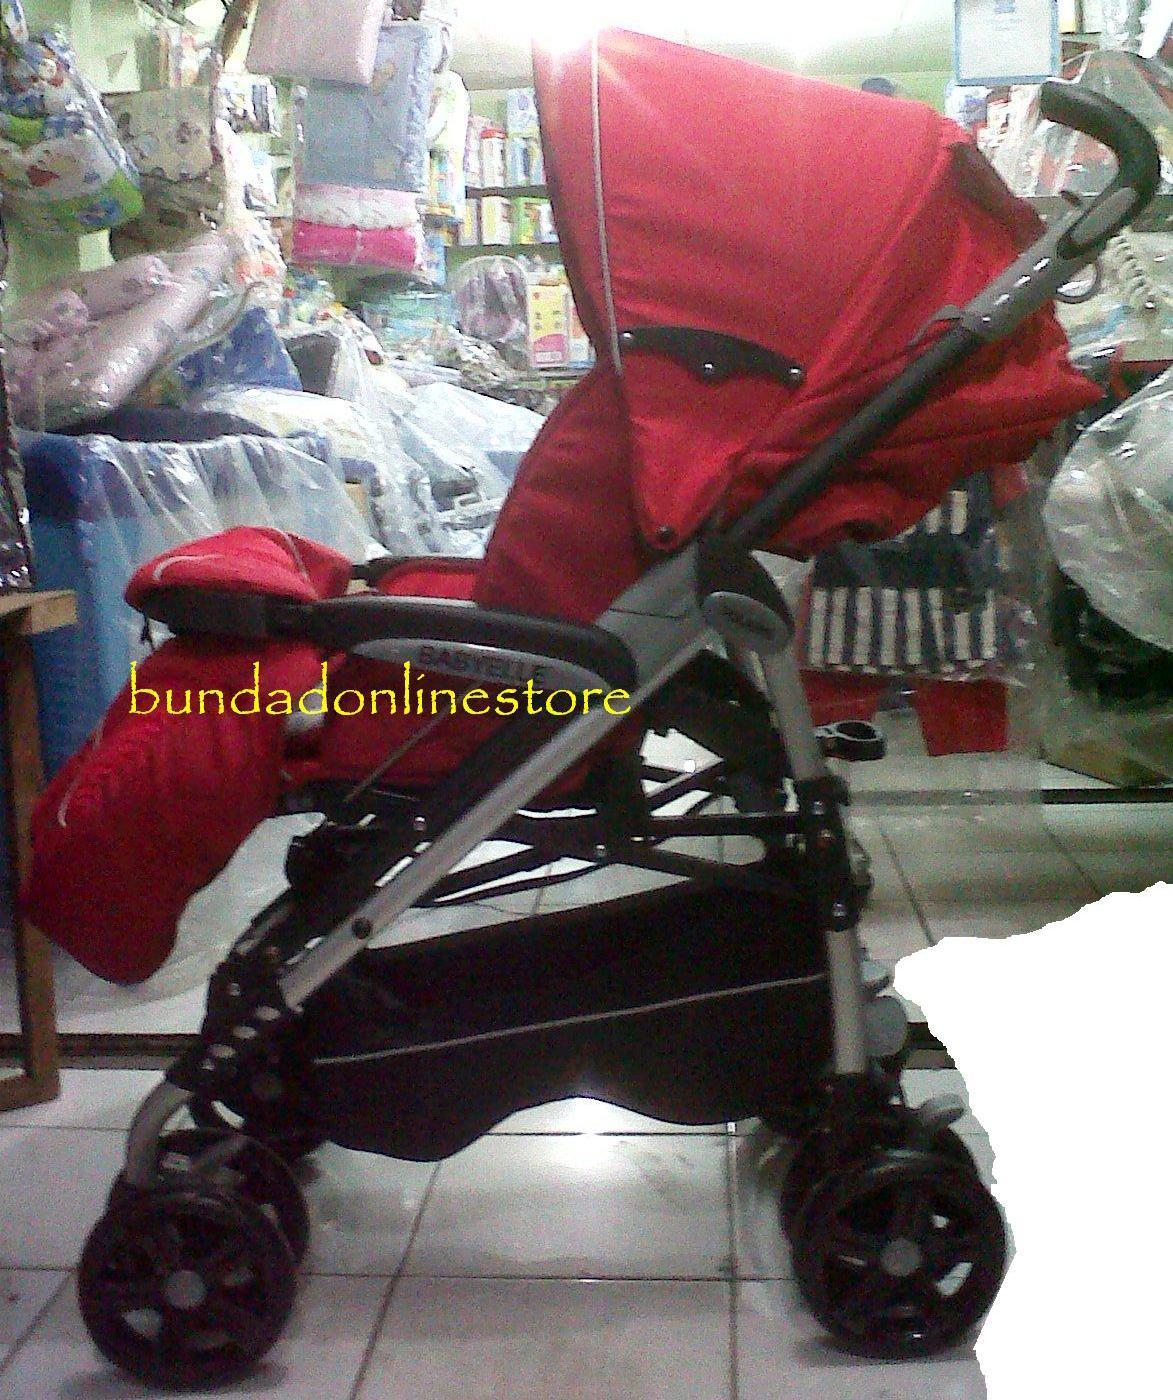 Bundadonlinestore Grow Baby Shop Stroller Baby Elle Polaris